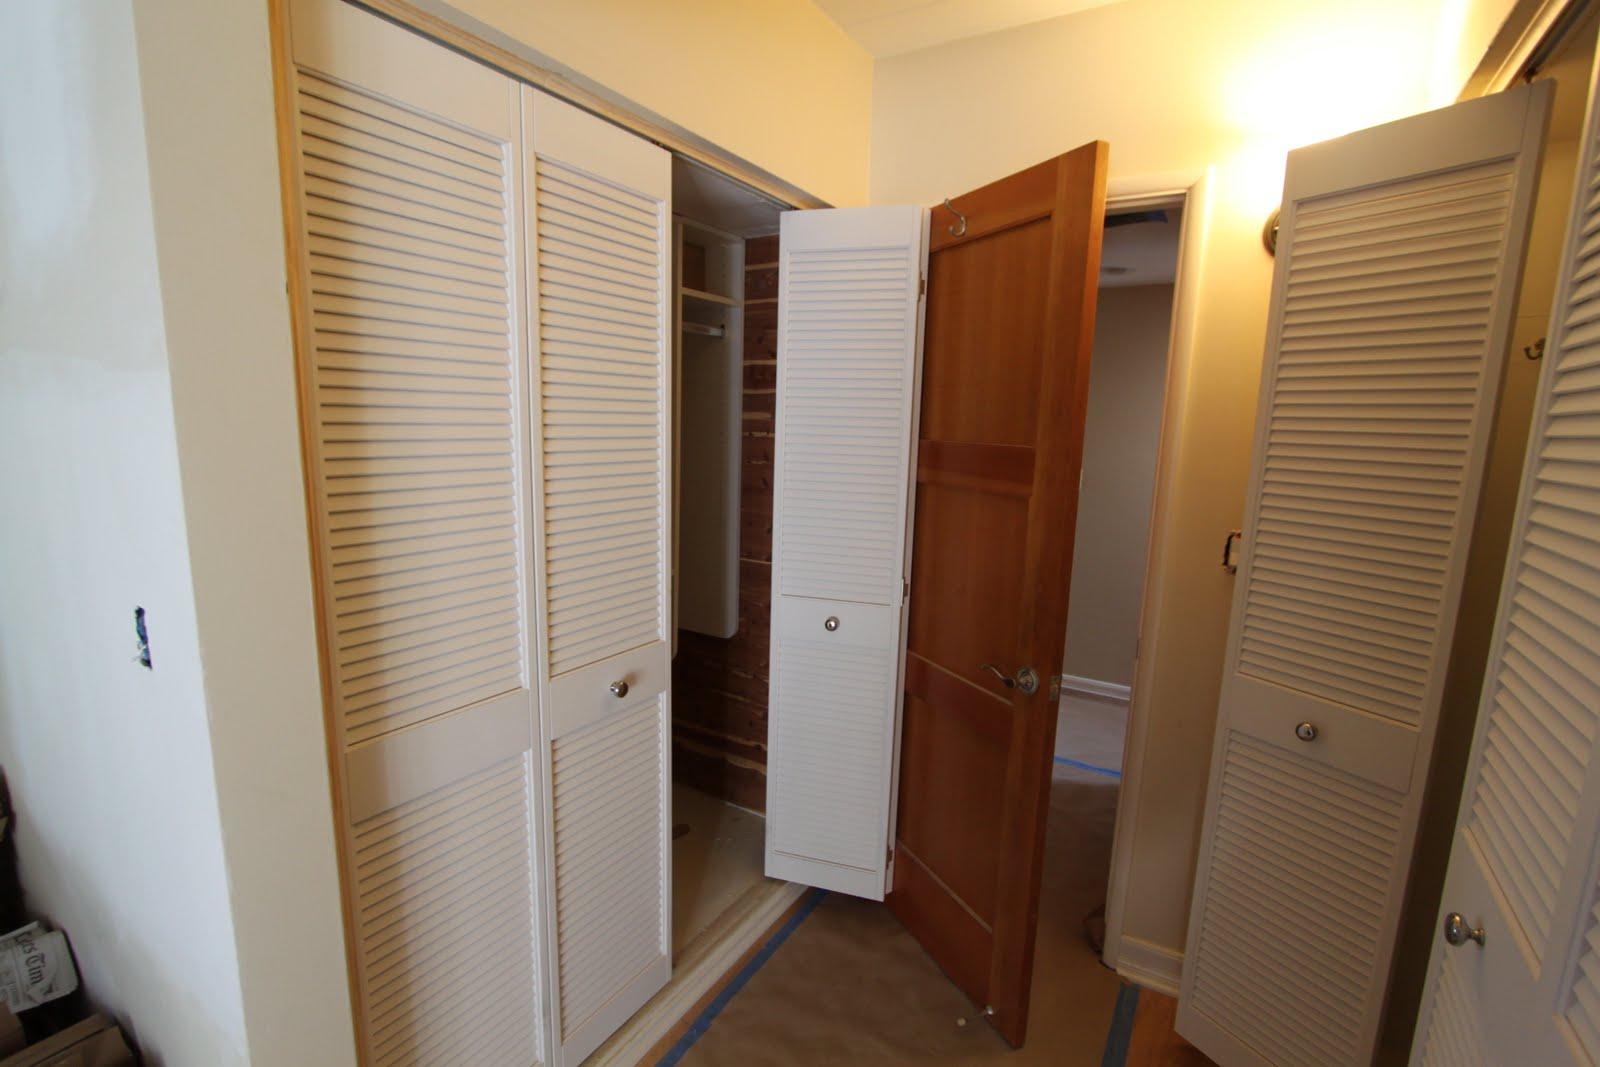 Louver Closet Doors In Remodel